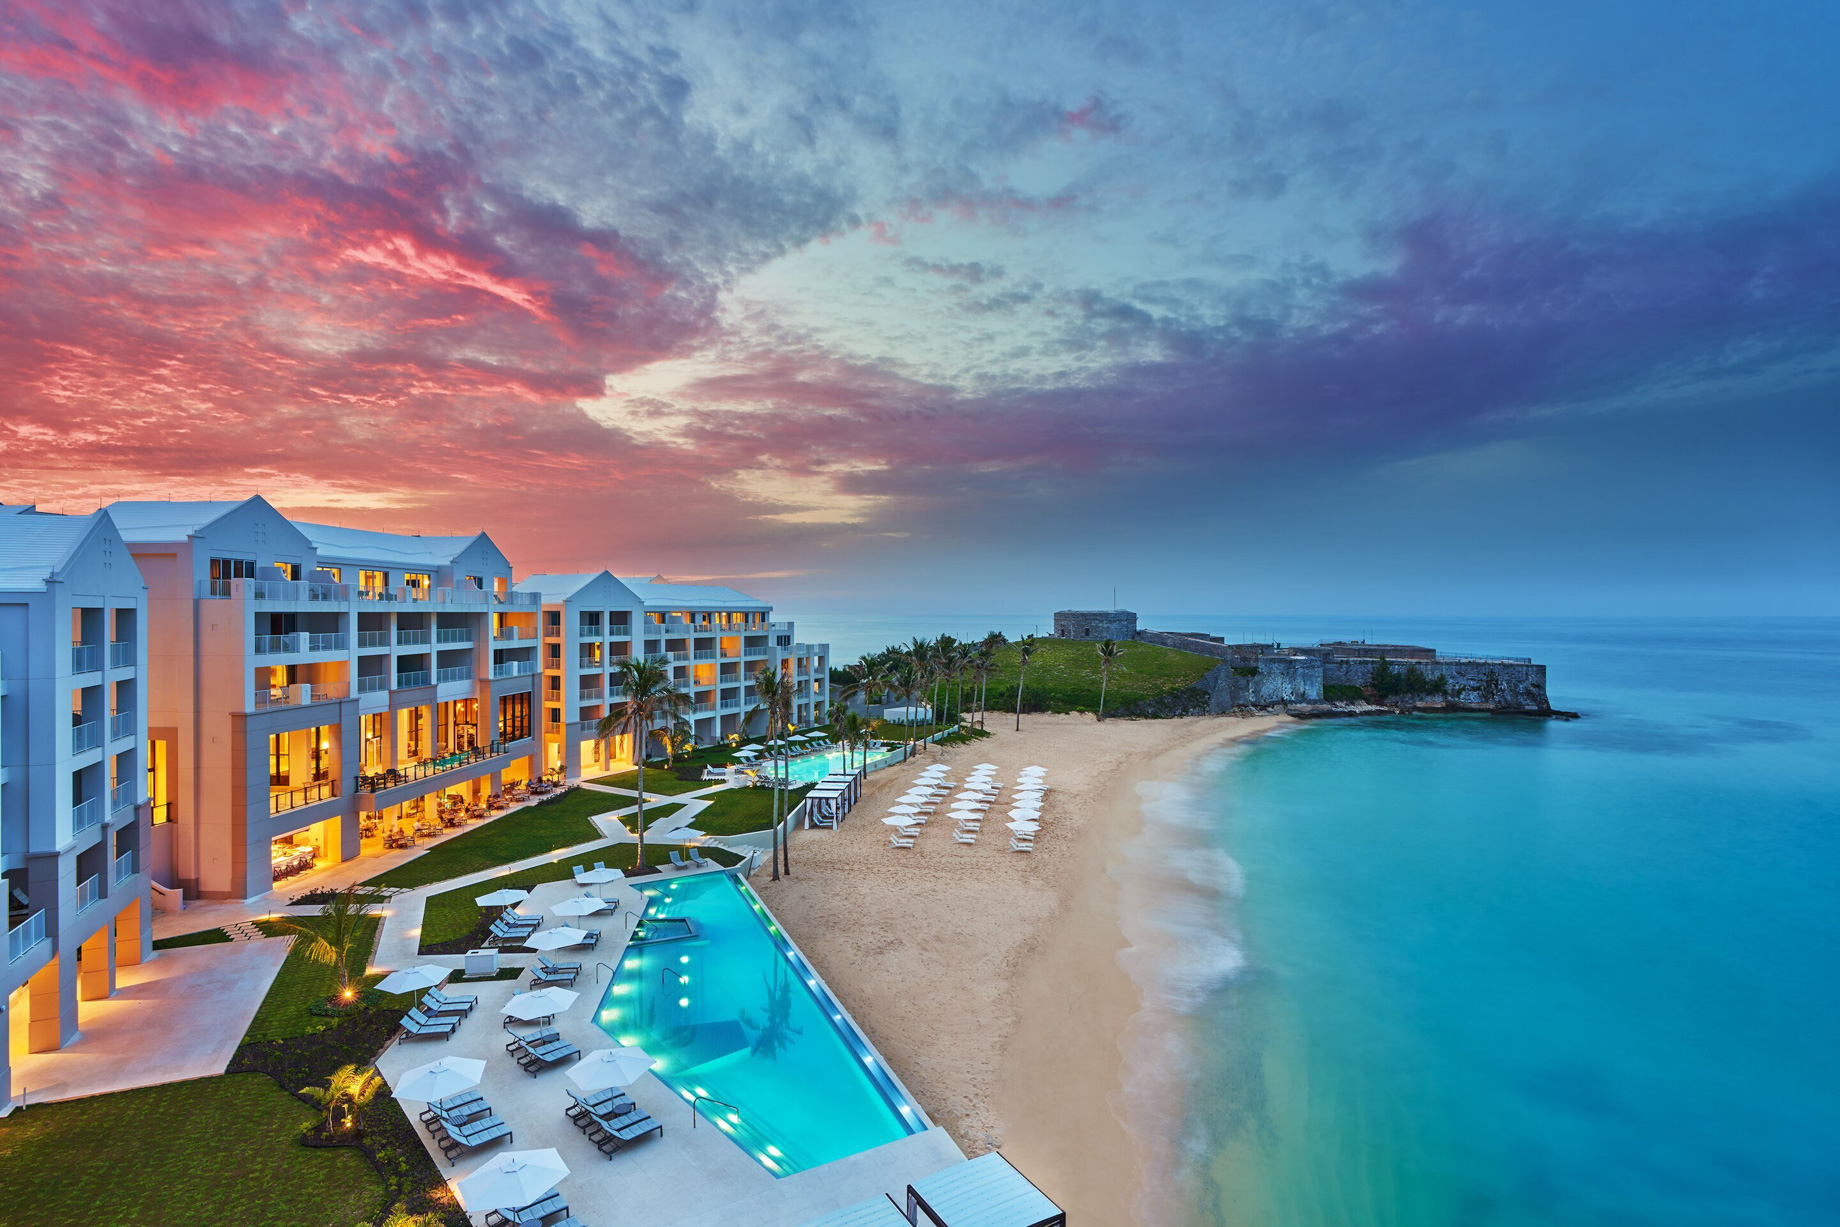 The St. Regis Bermuda Luxury Resort - St George's, Bermuda - Resort Sunset